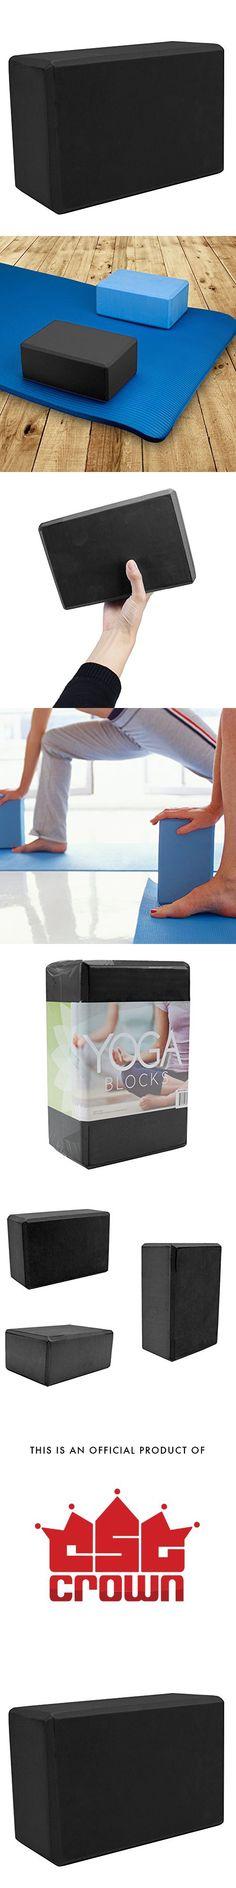 Crown Sporting Goods Large High Density Black Foam Yoga Block, 9 in x 6 in x 4 in